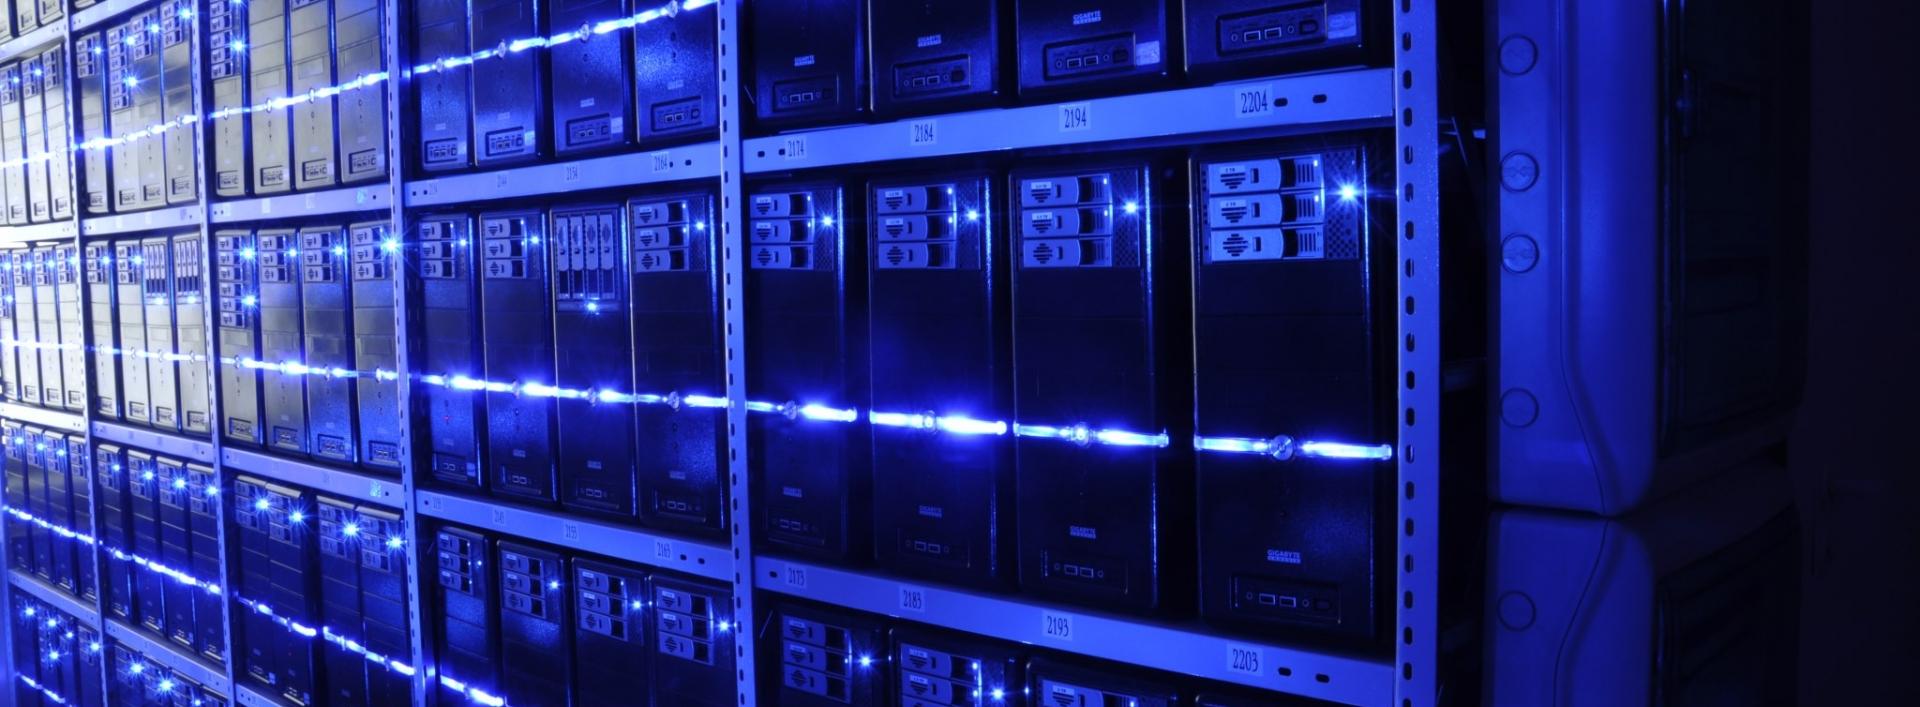 Racks of servers with blue lights